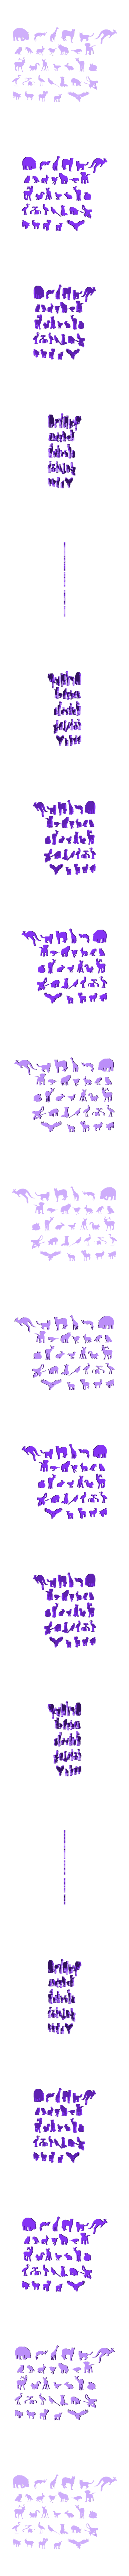 animaux .stl Download free STL file 2D animals • 3D printer template, Motek3D